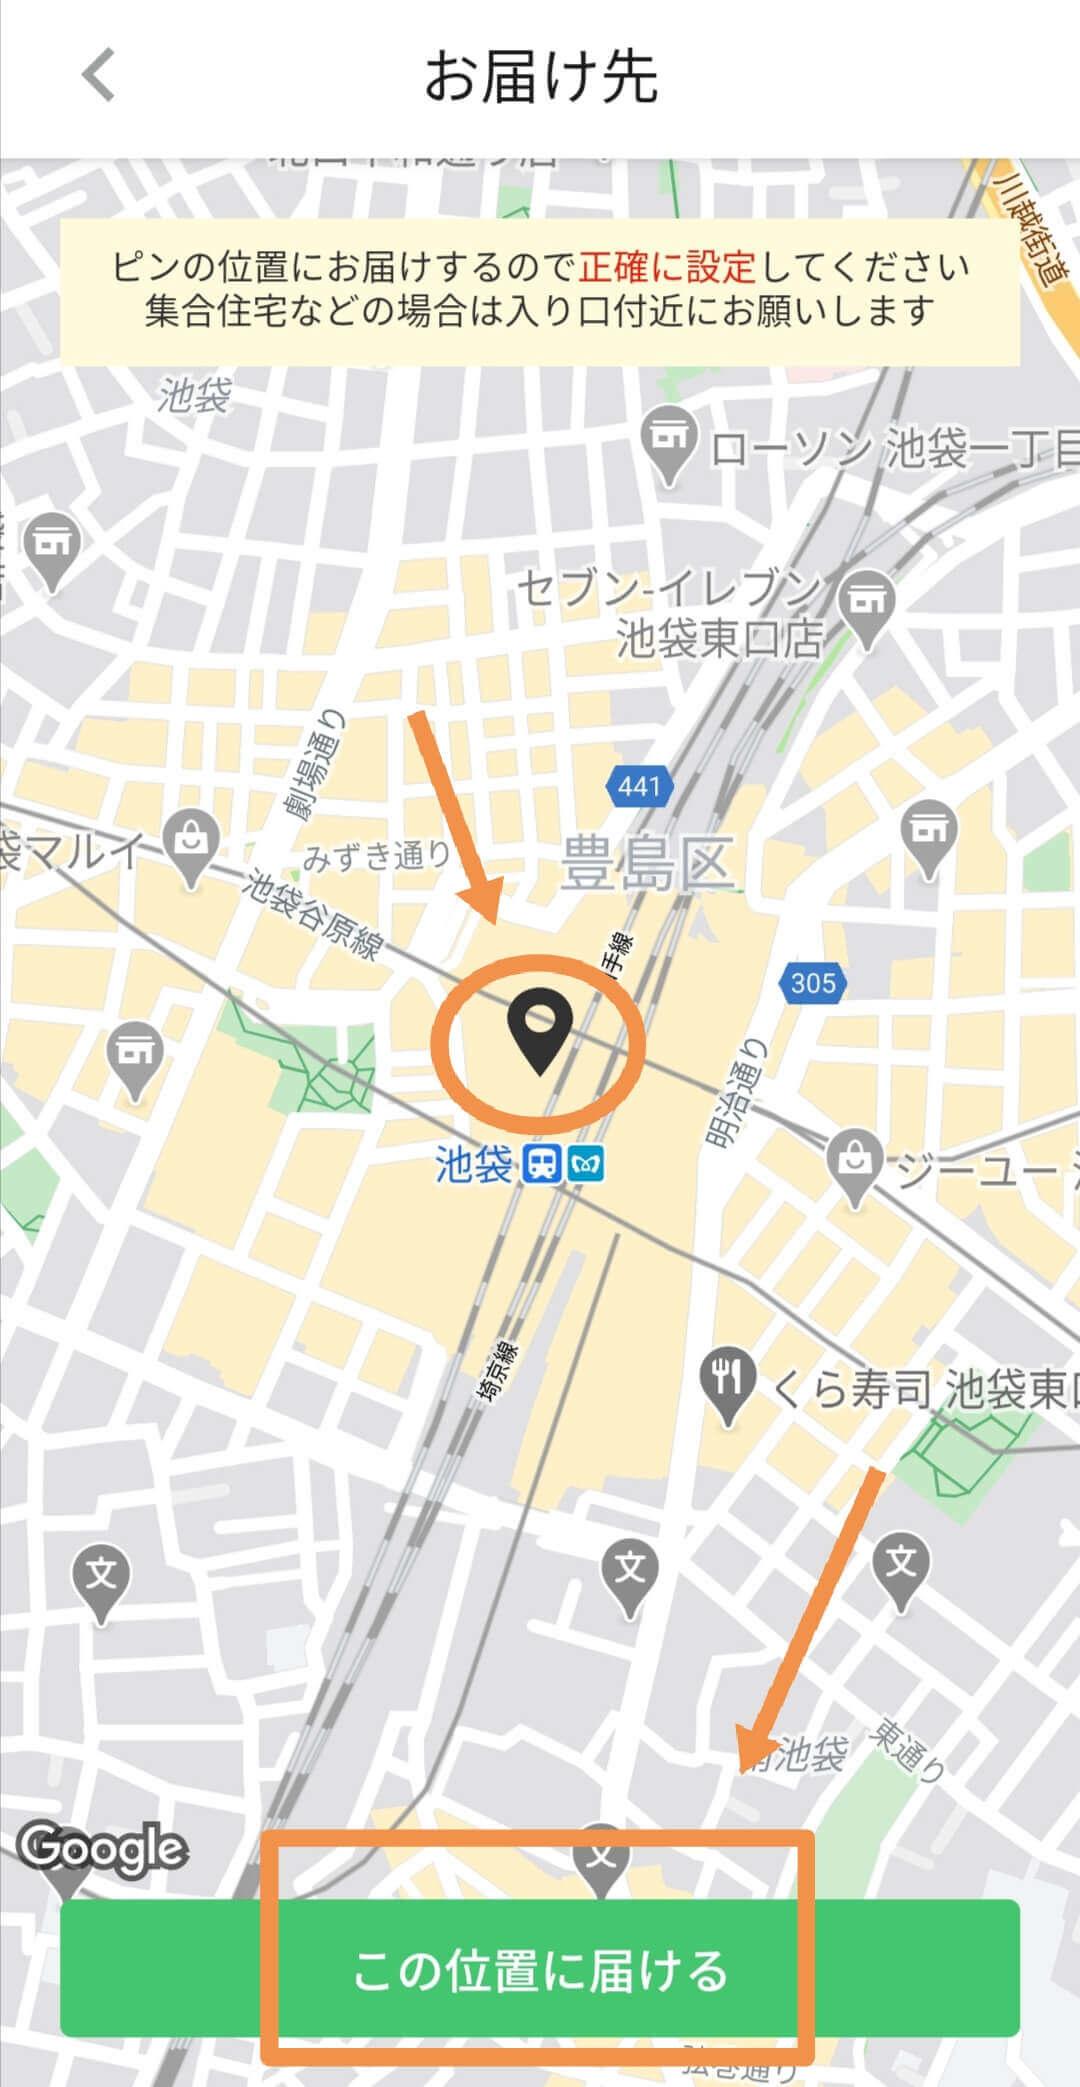 menu/メニュー東京エリア・配達対応地域の確認方法3